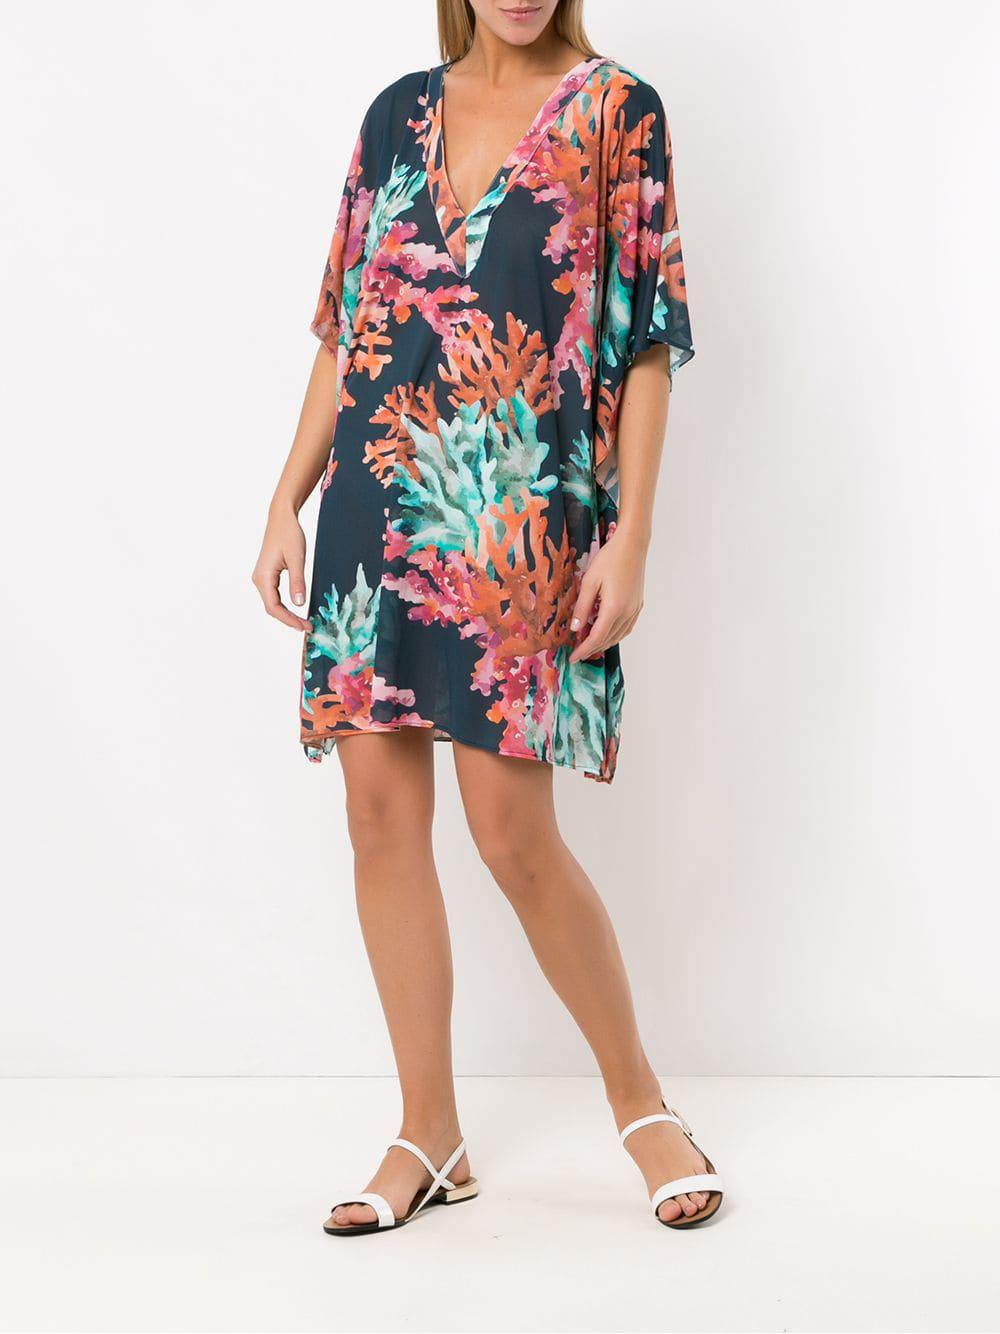 6b442cfd91 Brigitte Bardot Printed Beach Dress - Lyst